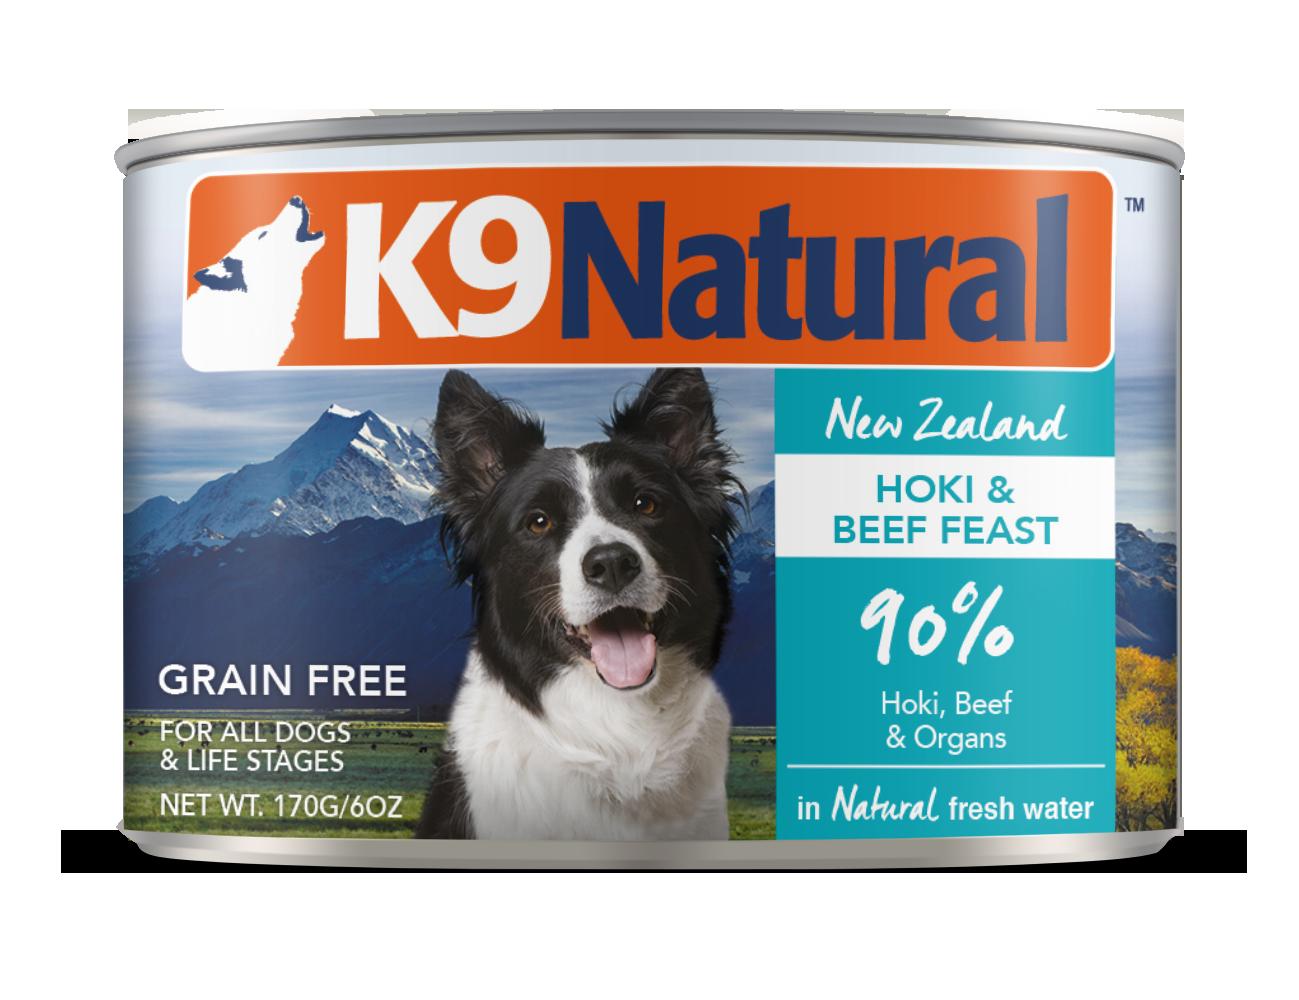 K9 Natural Hoki & Beef Feast Grain-Free Wet Dog Food, 6-oz can